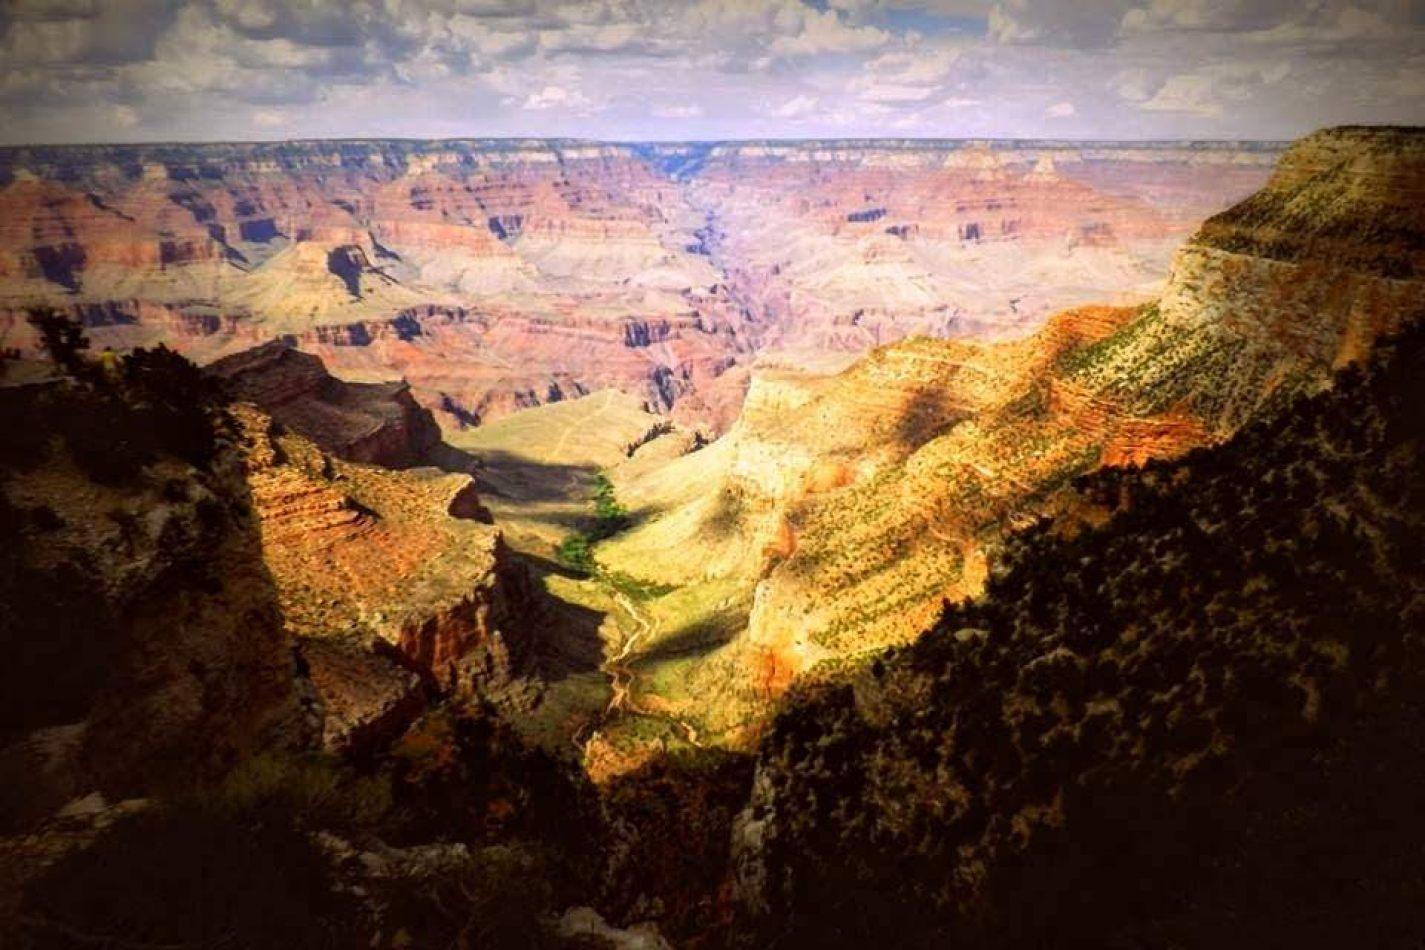 Hibiscus & Nomada : - - Grand Canyon